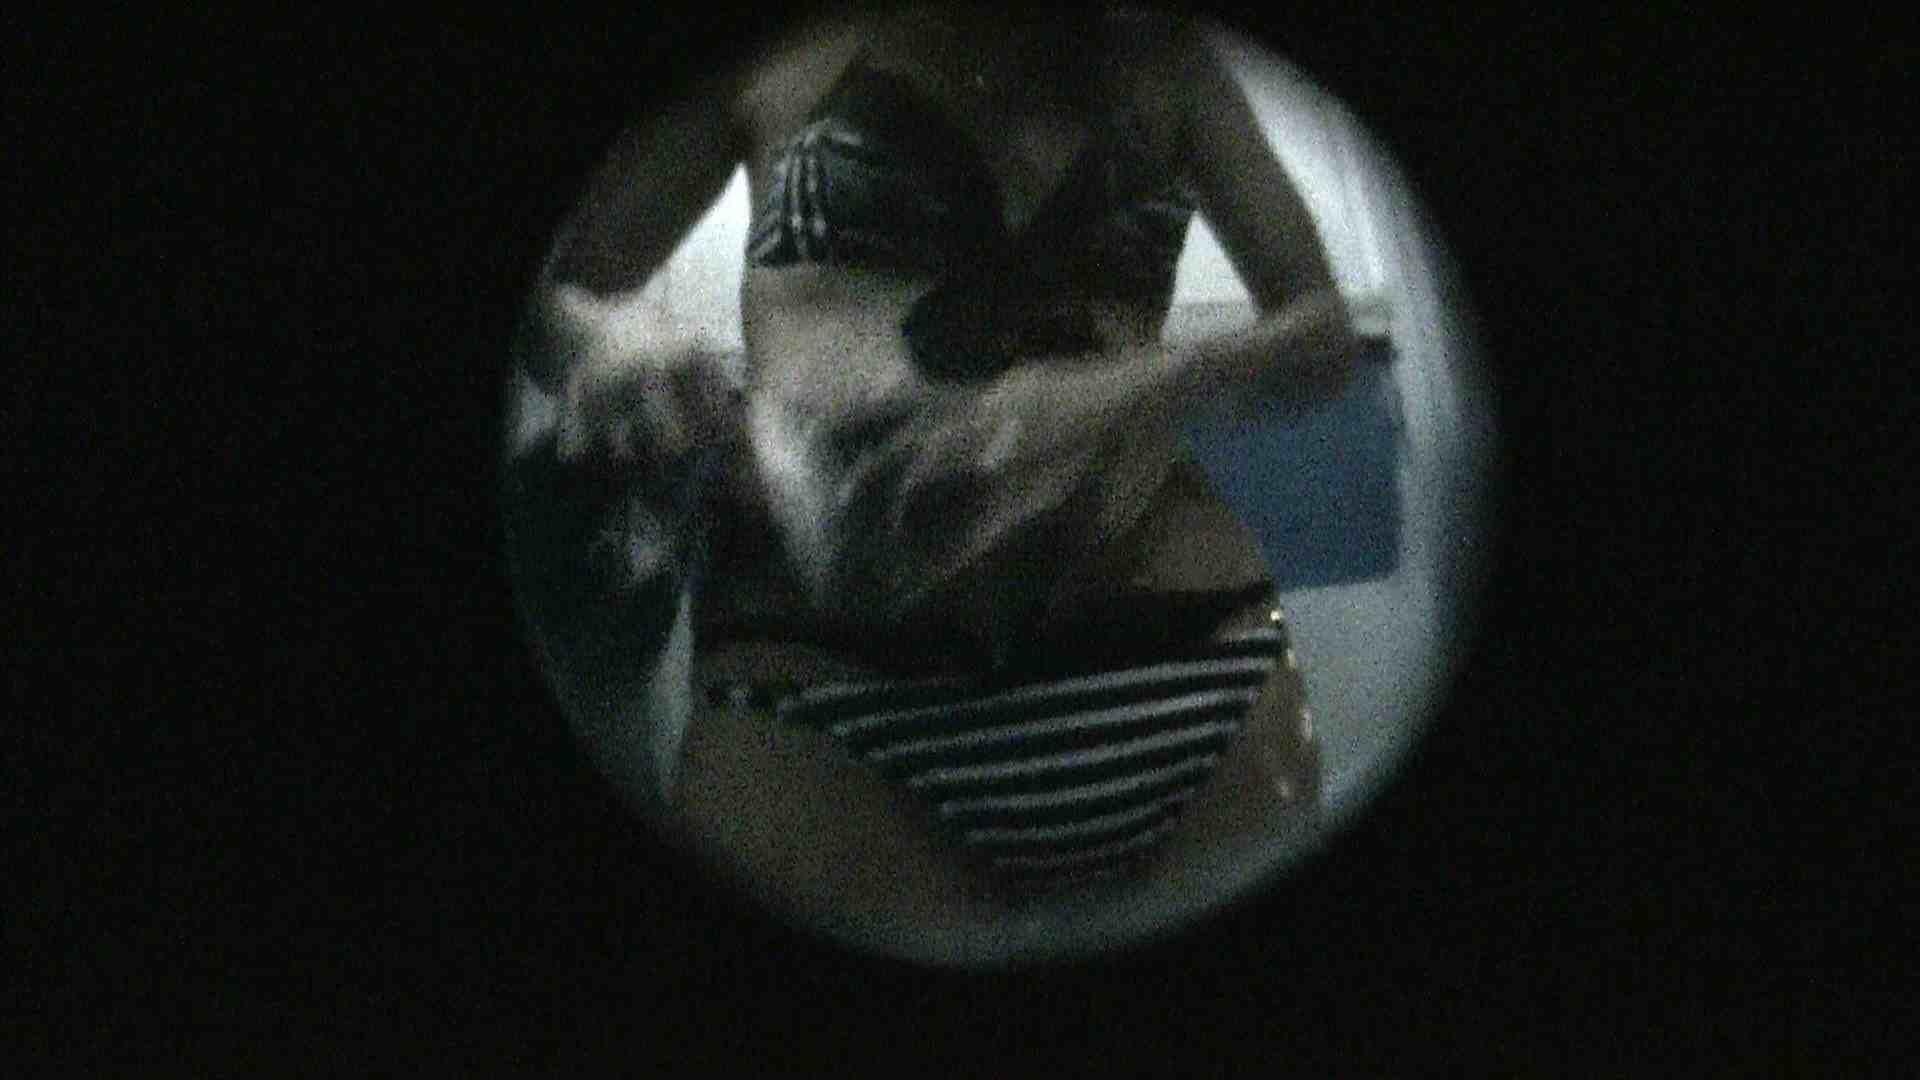 NO.13 暗いですが豪快な砂落としが好印象 覗き特集 われめAV動画紹介 88PIX 29